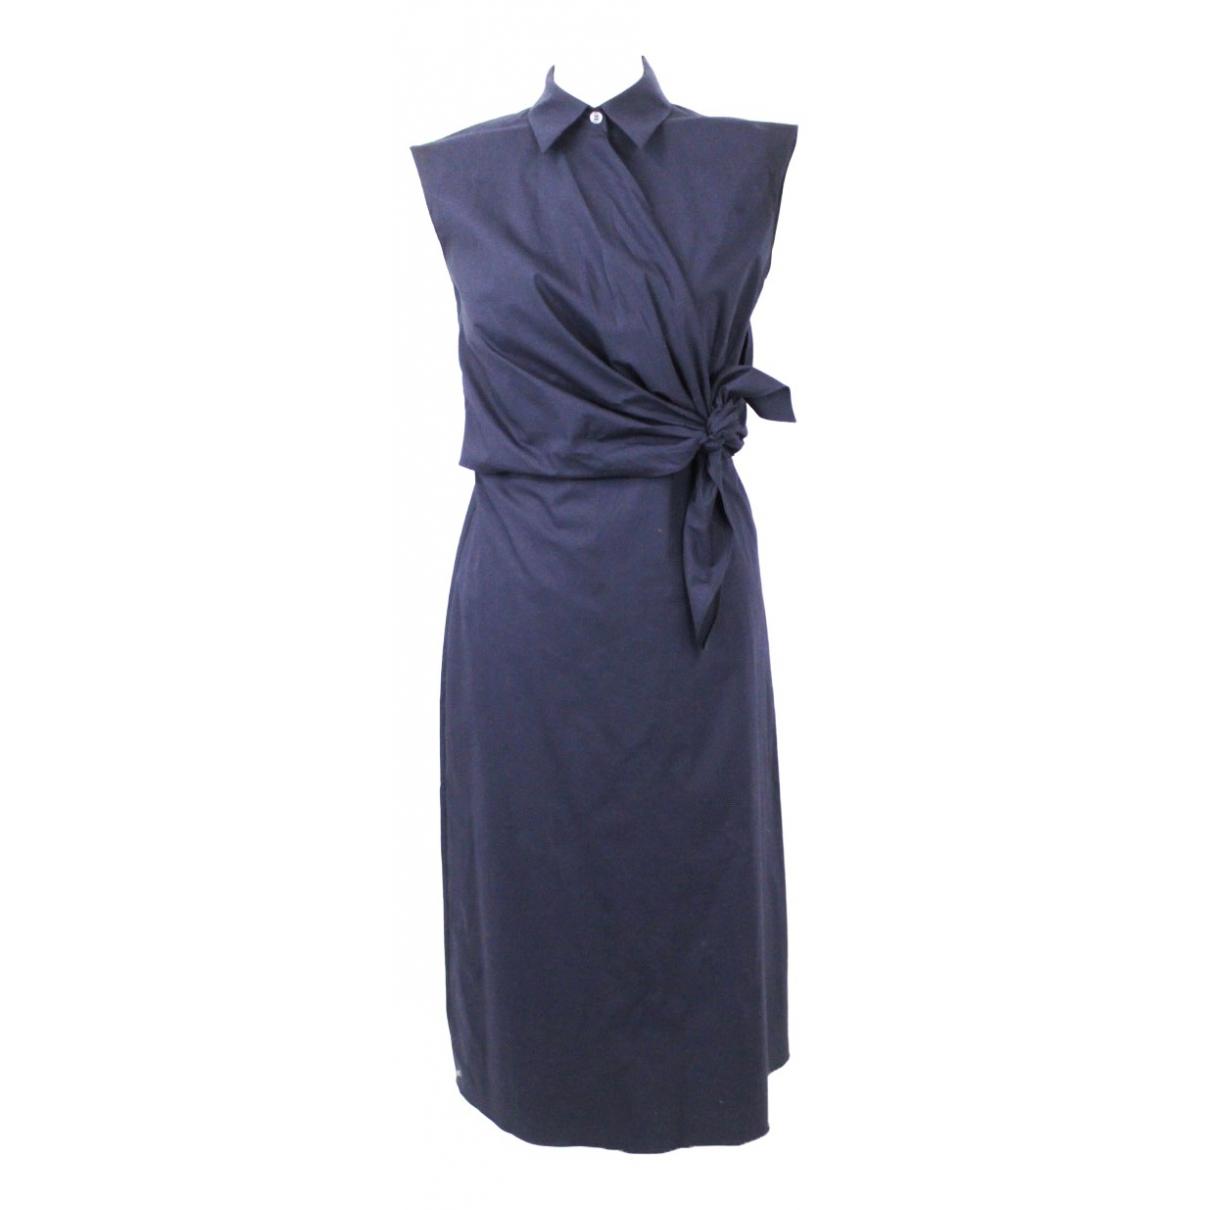 J.w. Anderson \N Navy Cotton dress for Women 8 UK